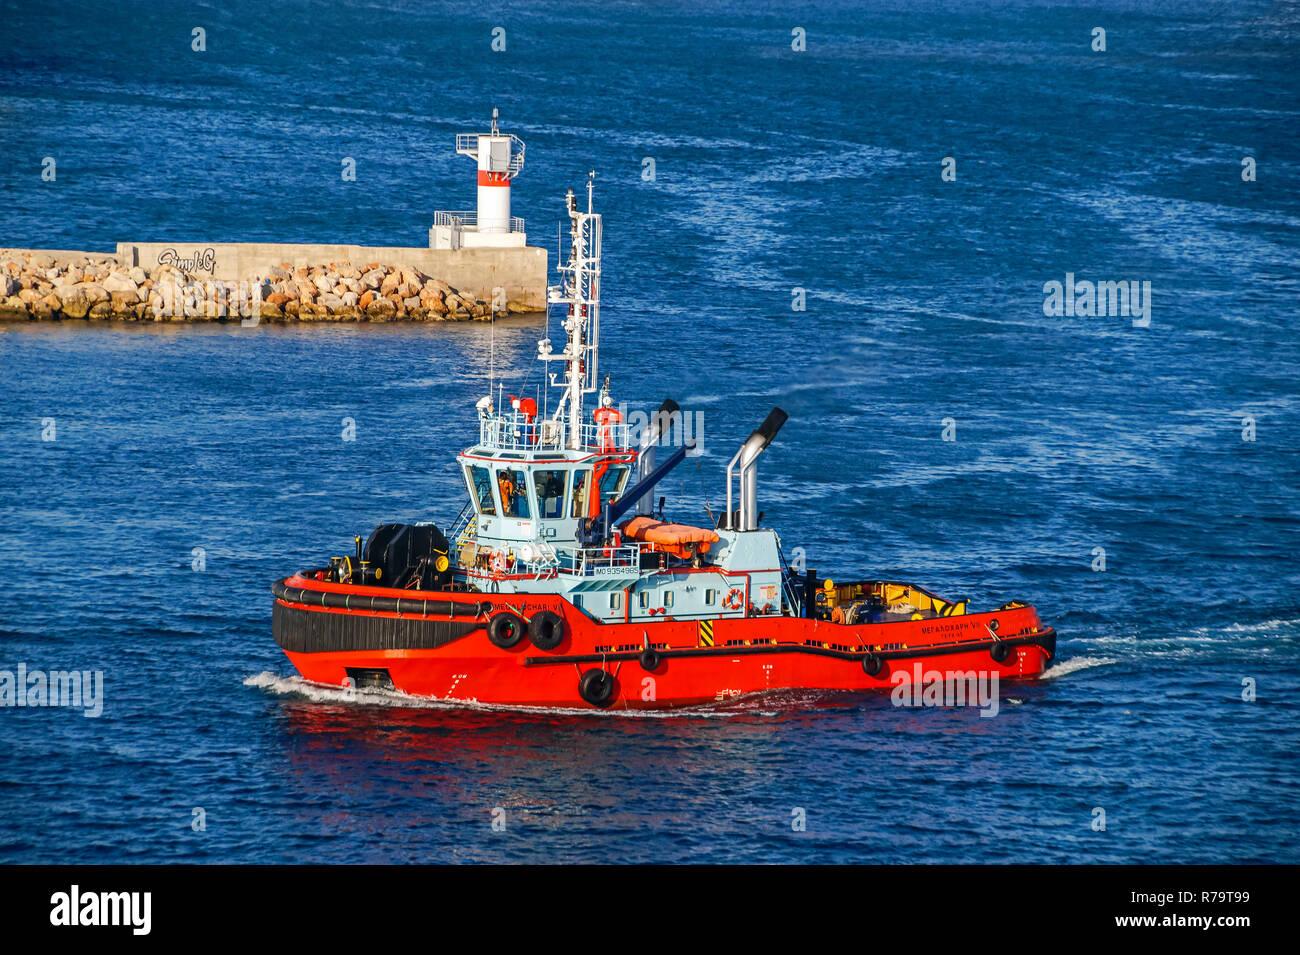 Tug boat megalochari VI at entrance to port of Piraeus